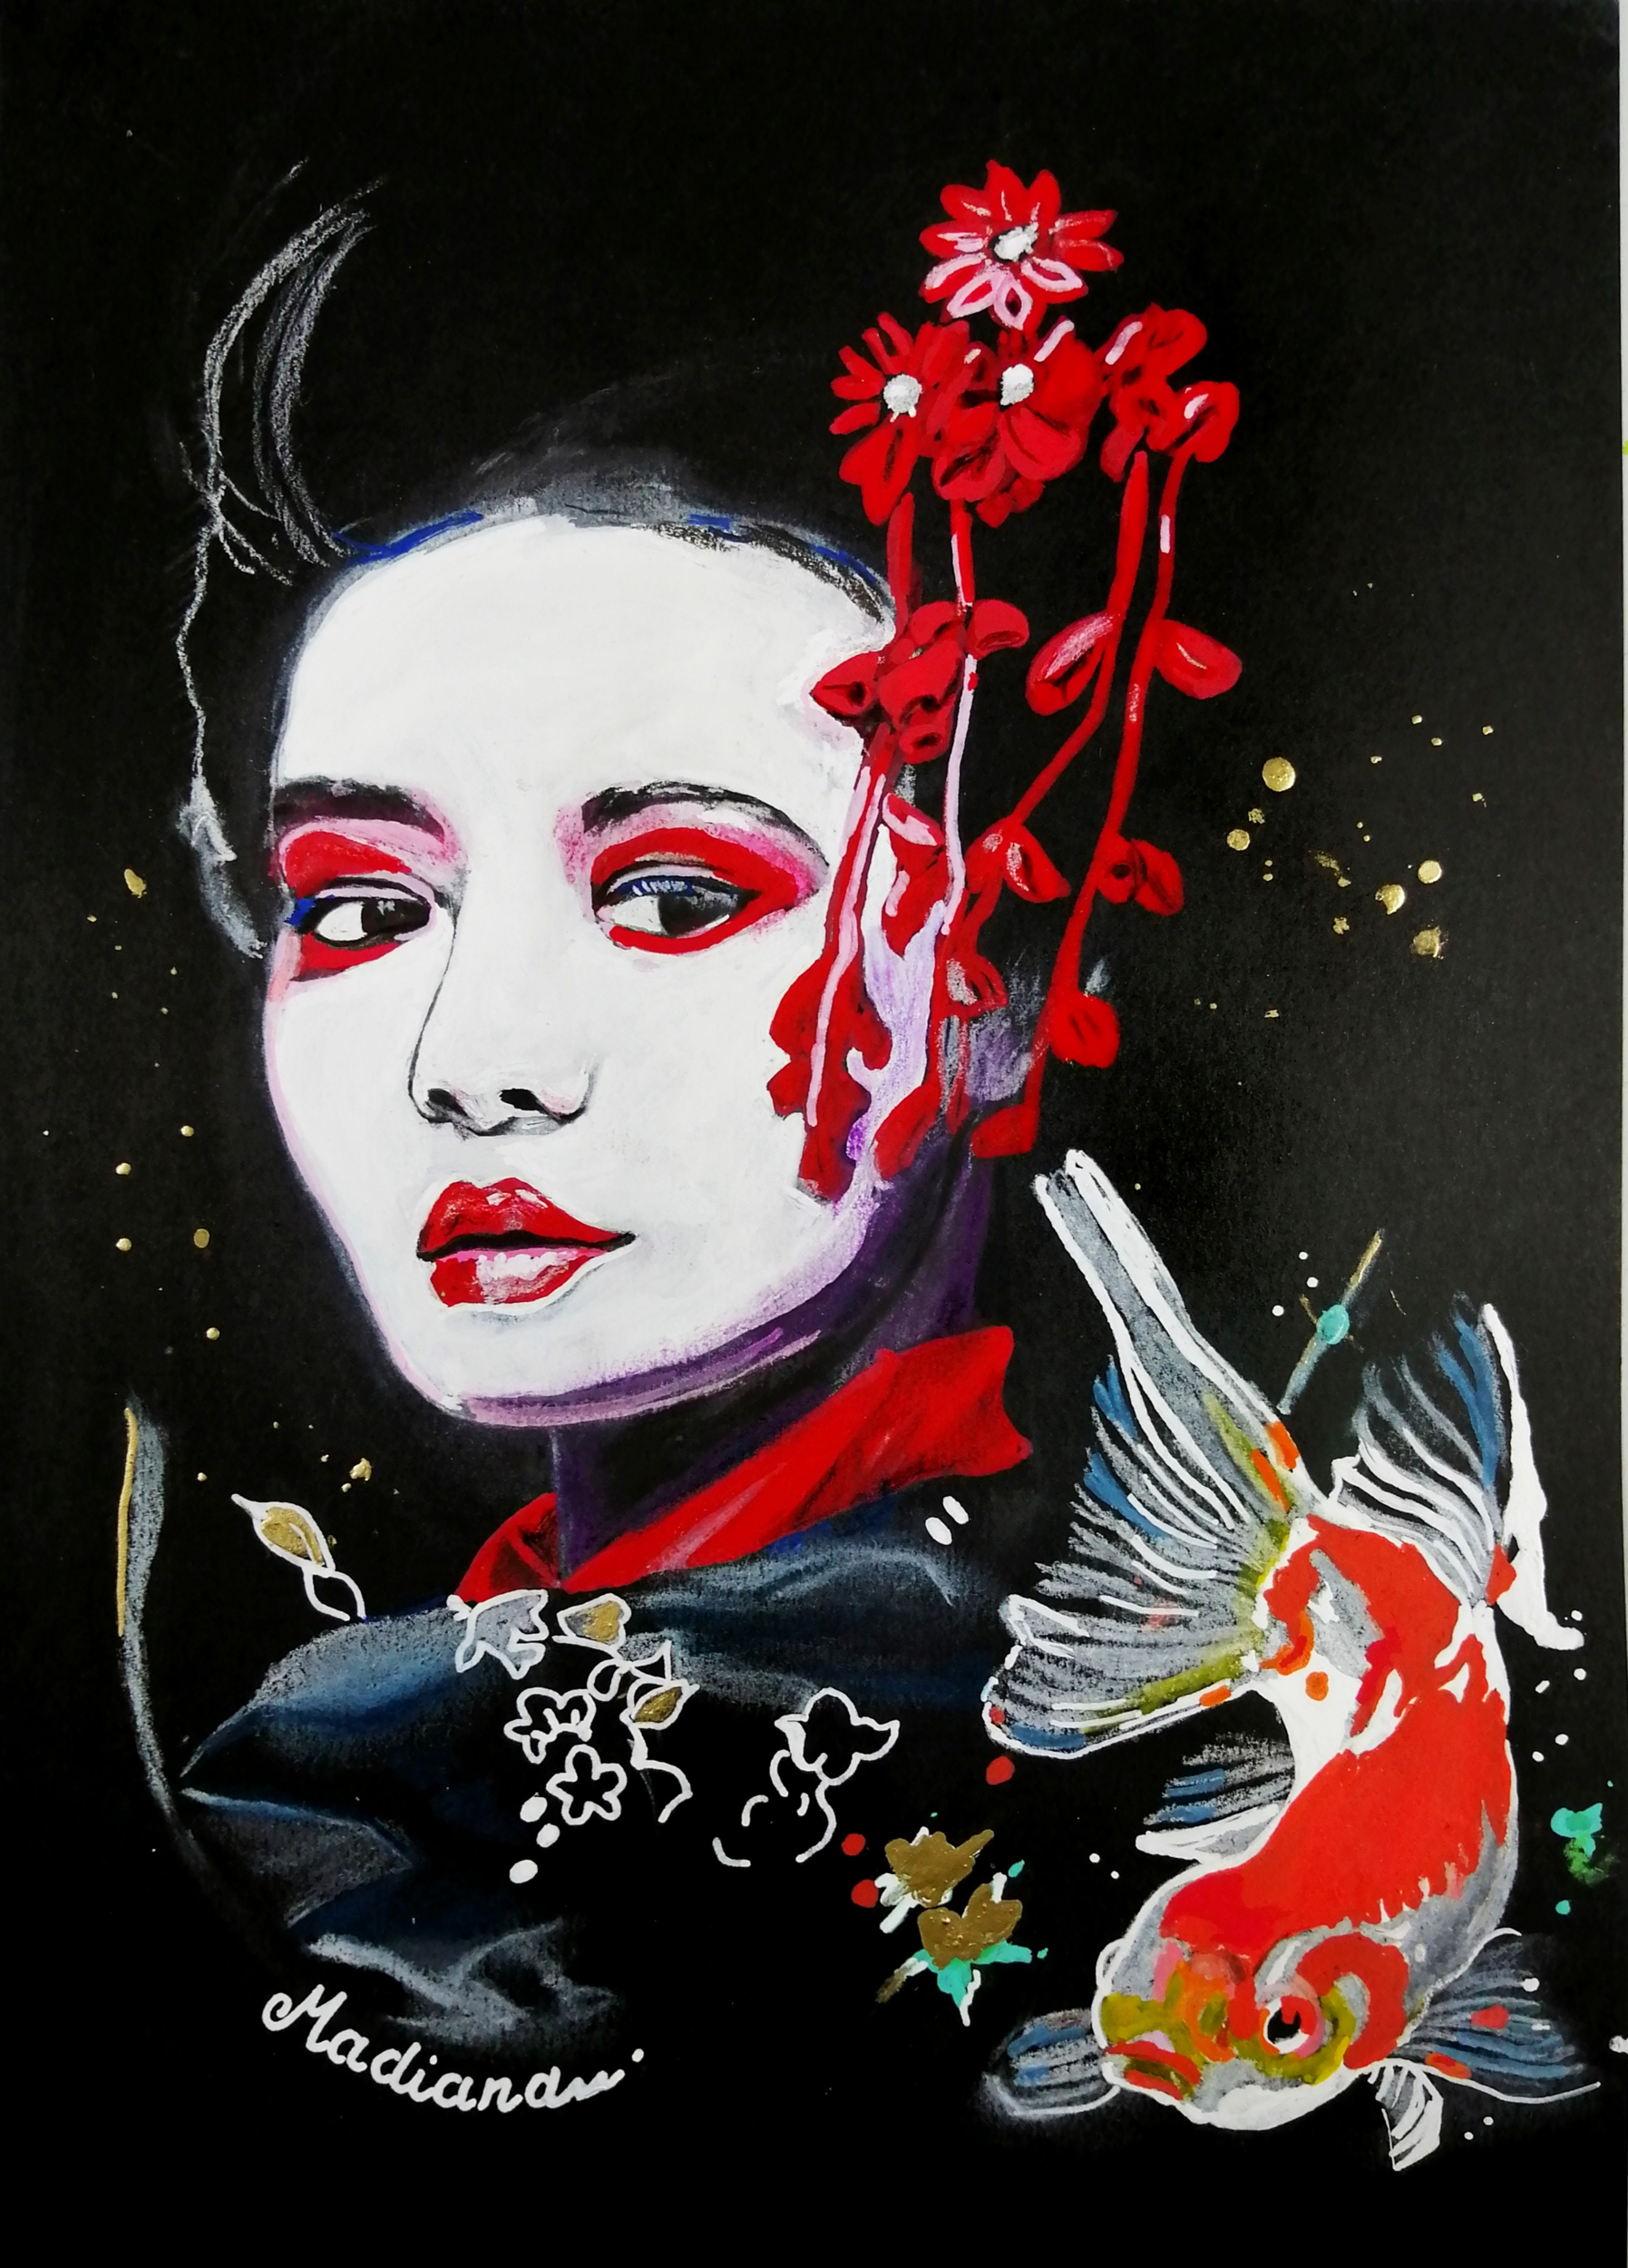 dessin femme geisha carpe koï street art fusain